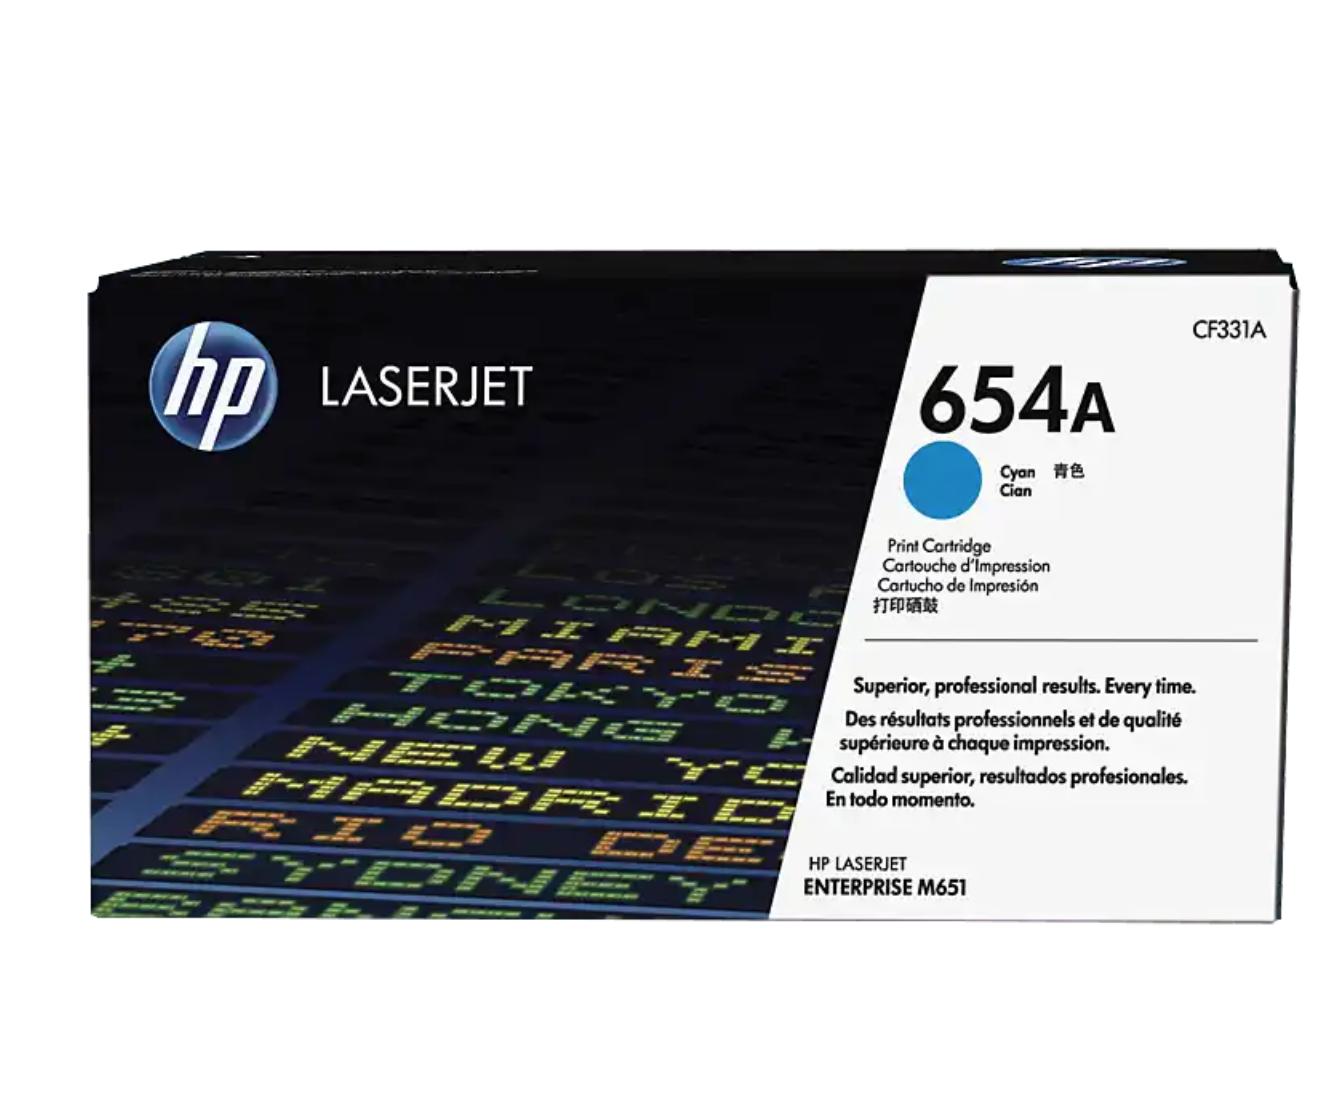 HP 654A 綻藍原廠 LaserJet 碳粉 CF331A